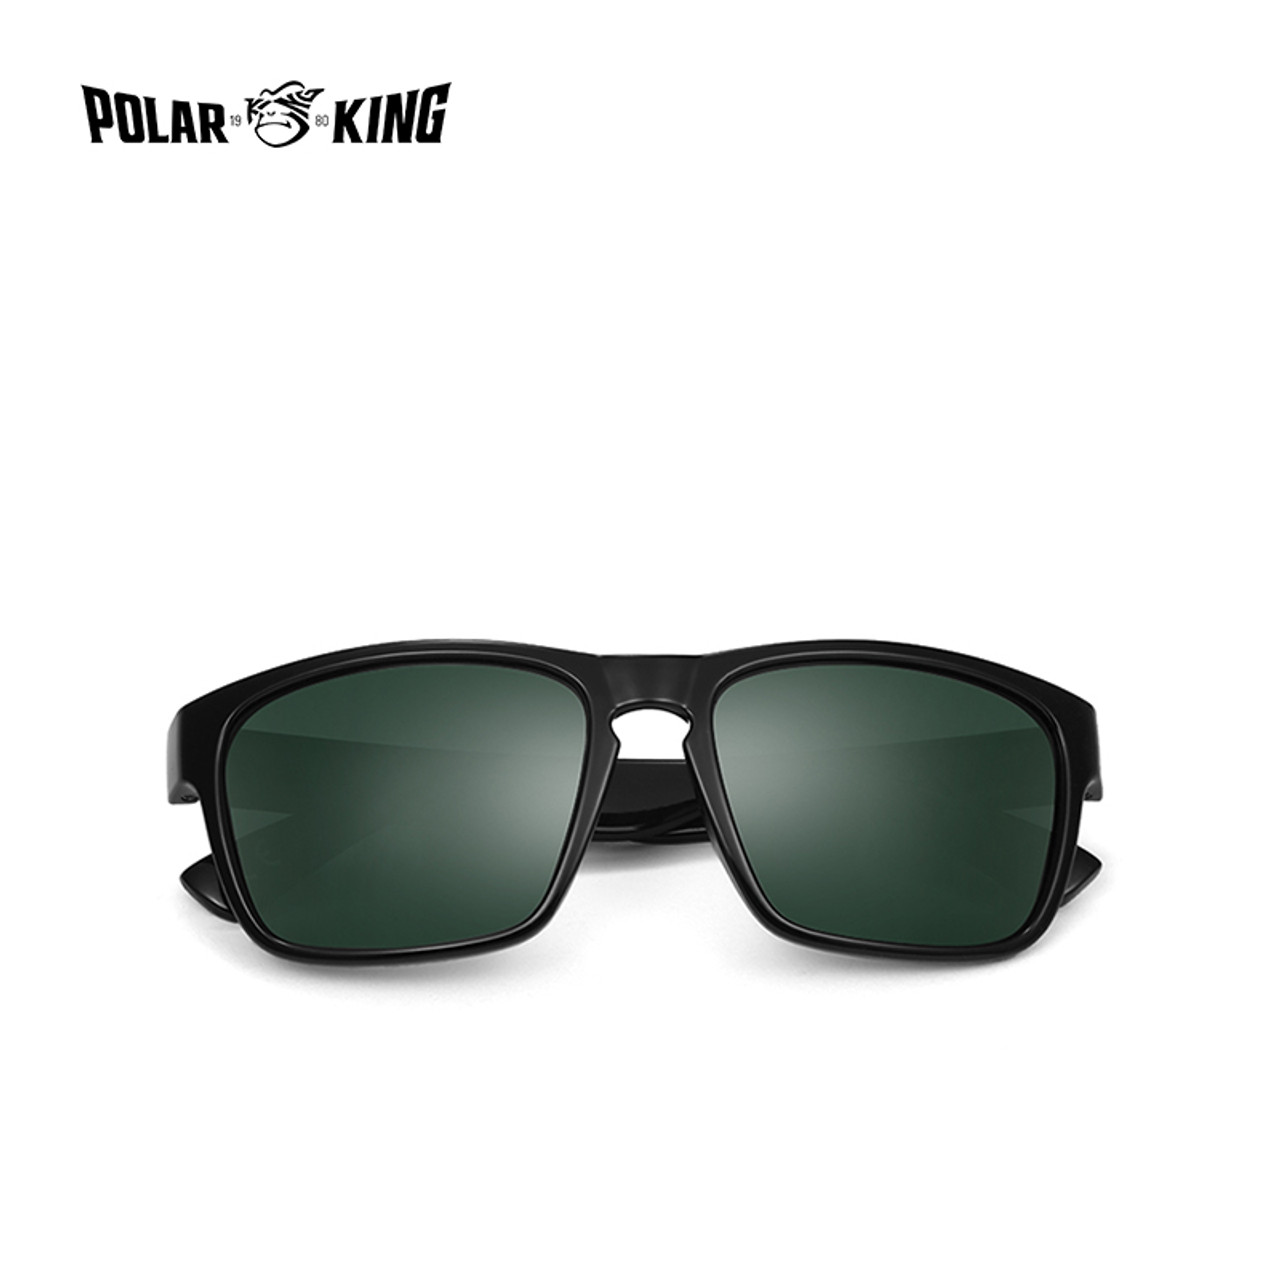 bc10052b12aa5 ... POLARKING Brand Polarized Sunglasses For Men Plastic Oculos de sol Men s  Fashion Square Driving Eyewear Travel ...